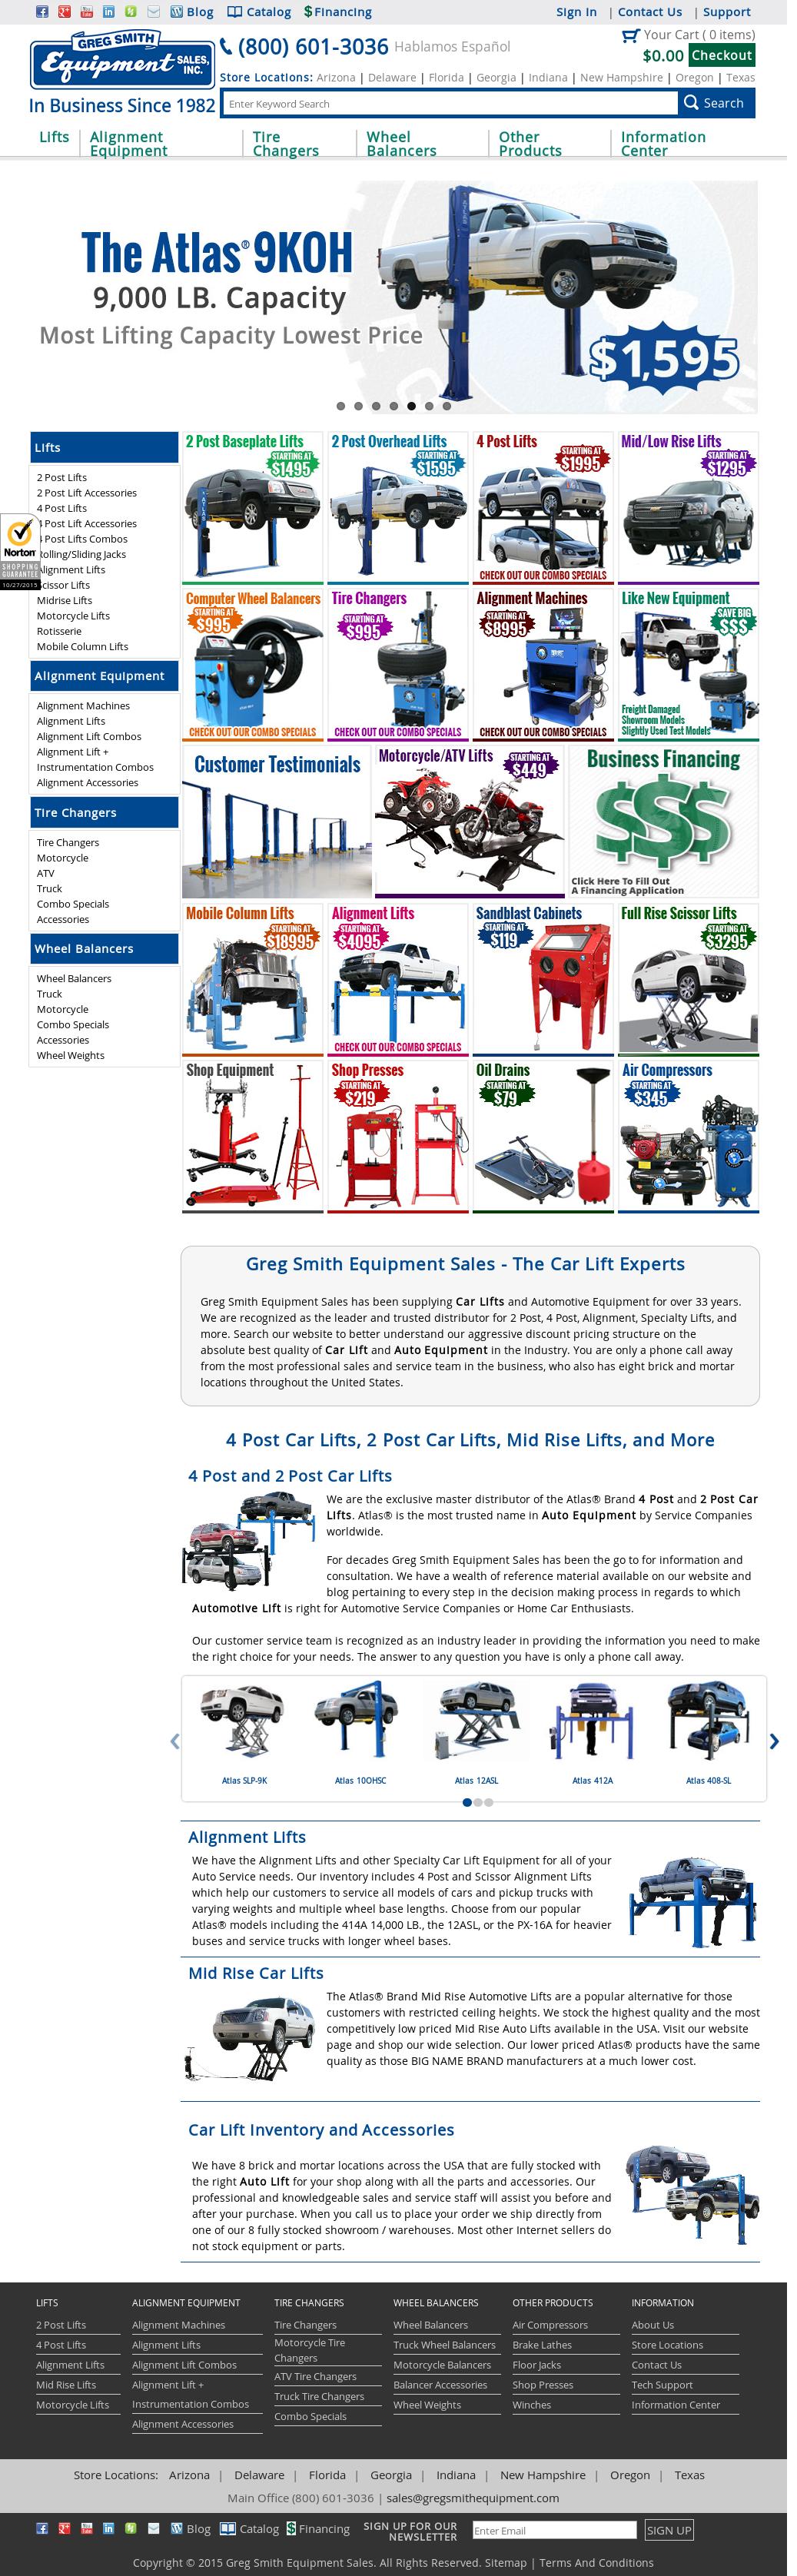 Gregsmithequipment Competitors, Revenue and Employees